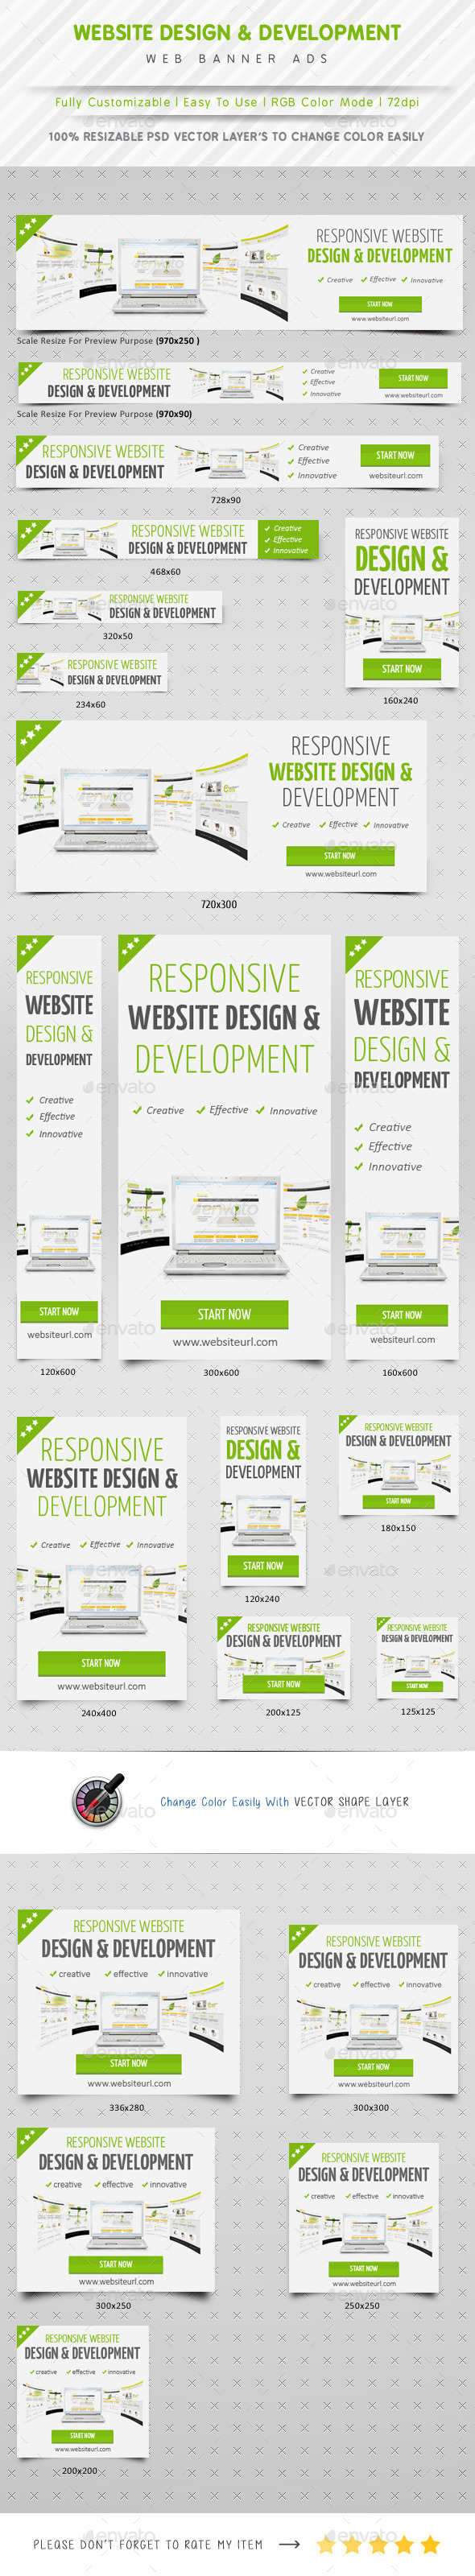 Website Design & Development Banner Ads - Banners & Ads Web Elements